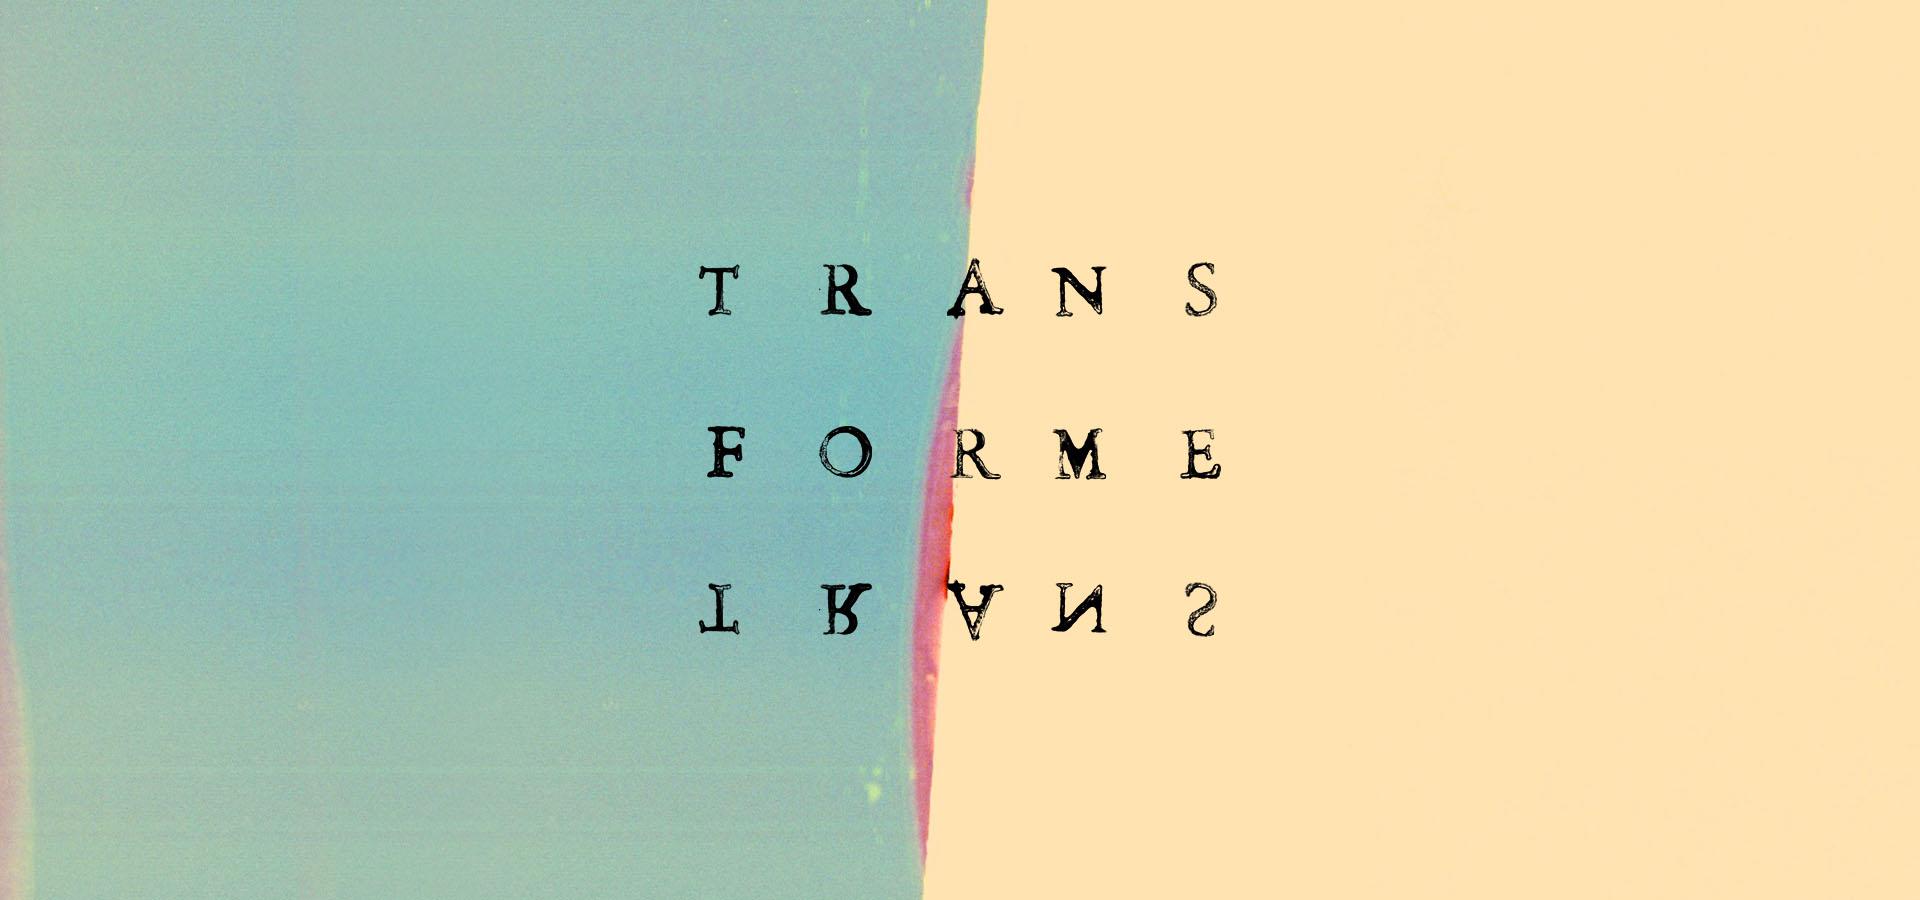 maison maj transforme typographie